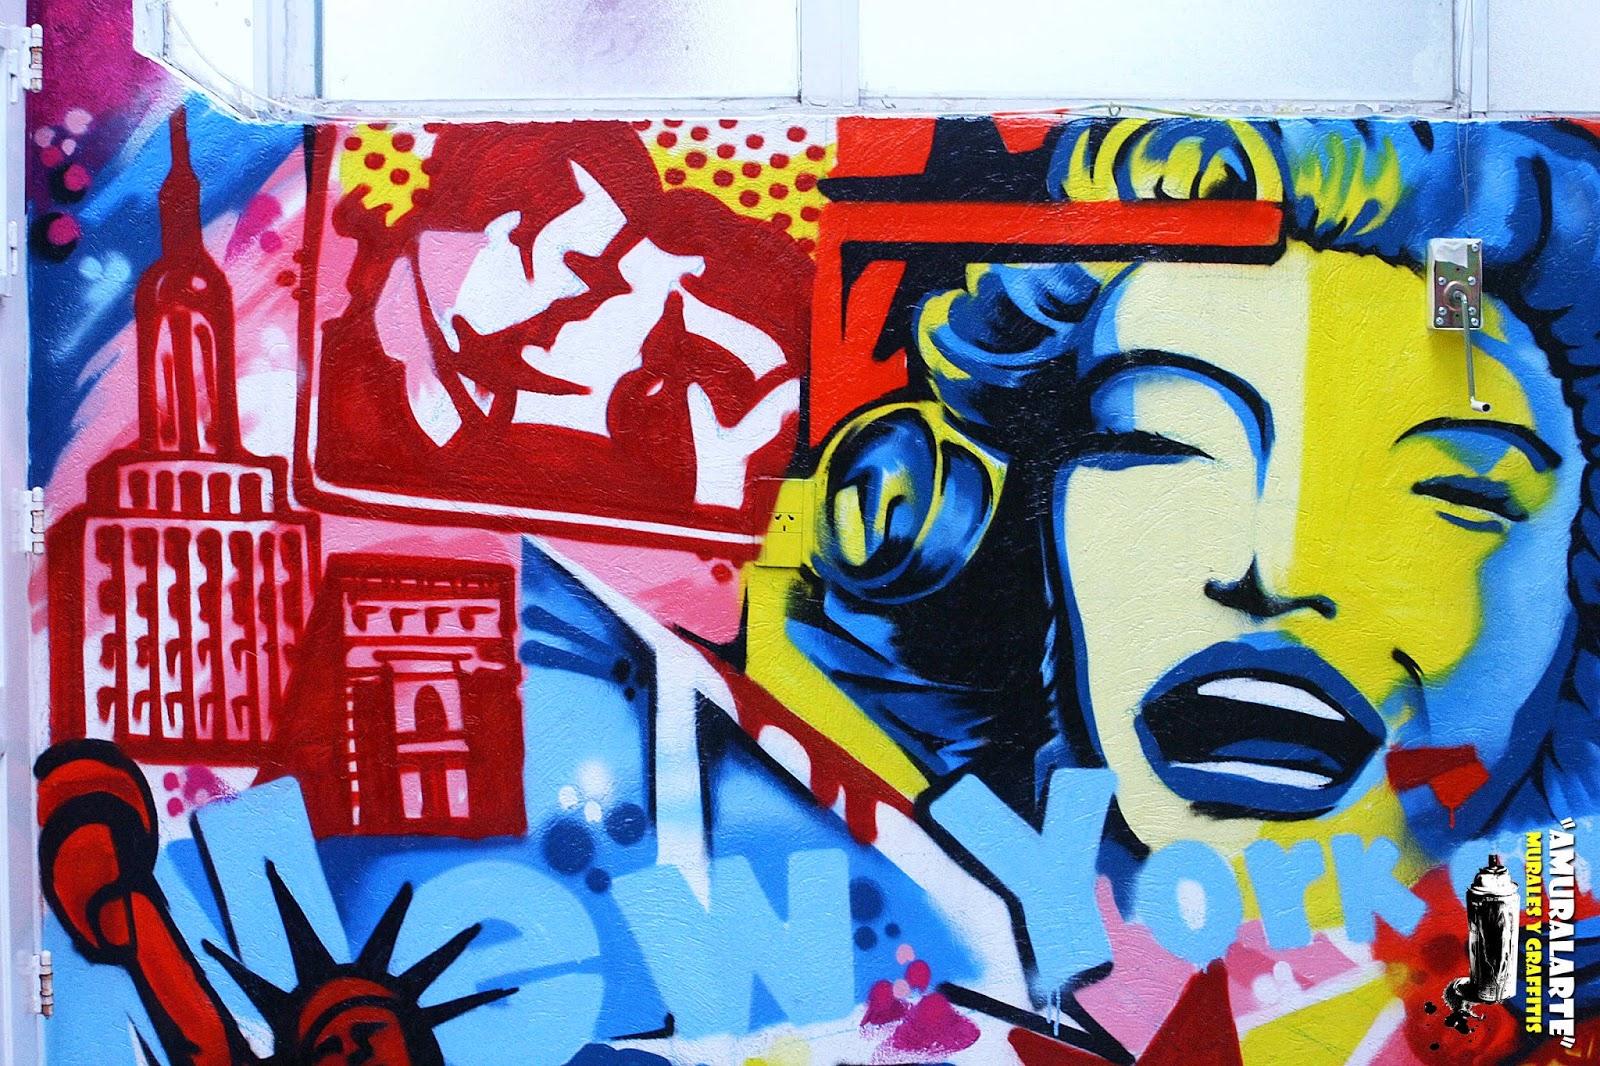 Amuralarte graffitis y murales personalizados